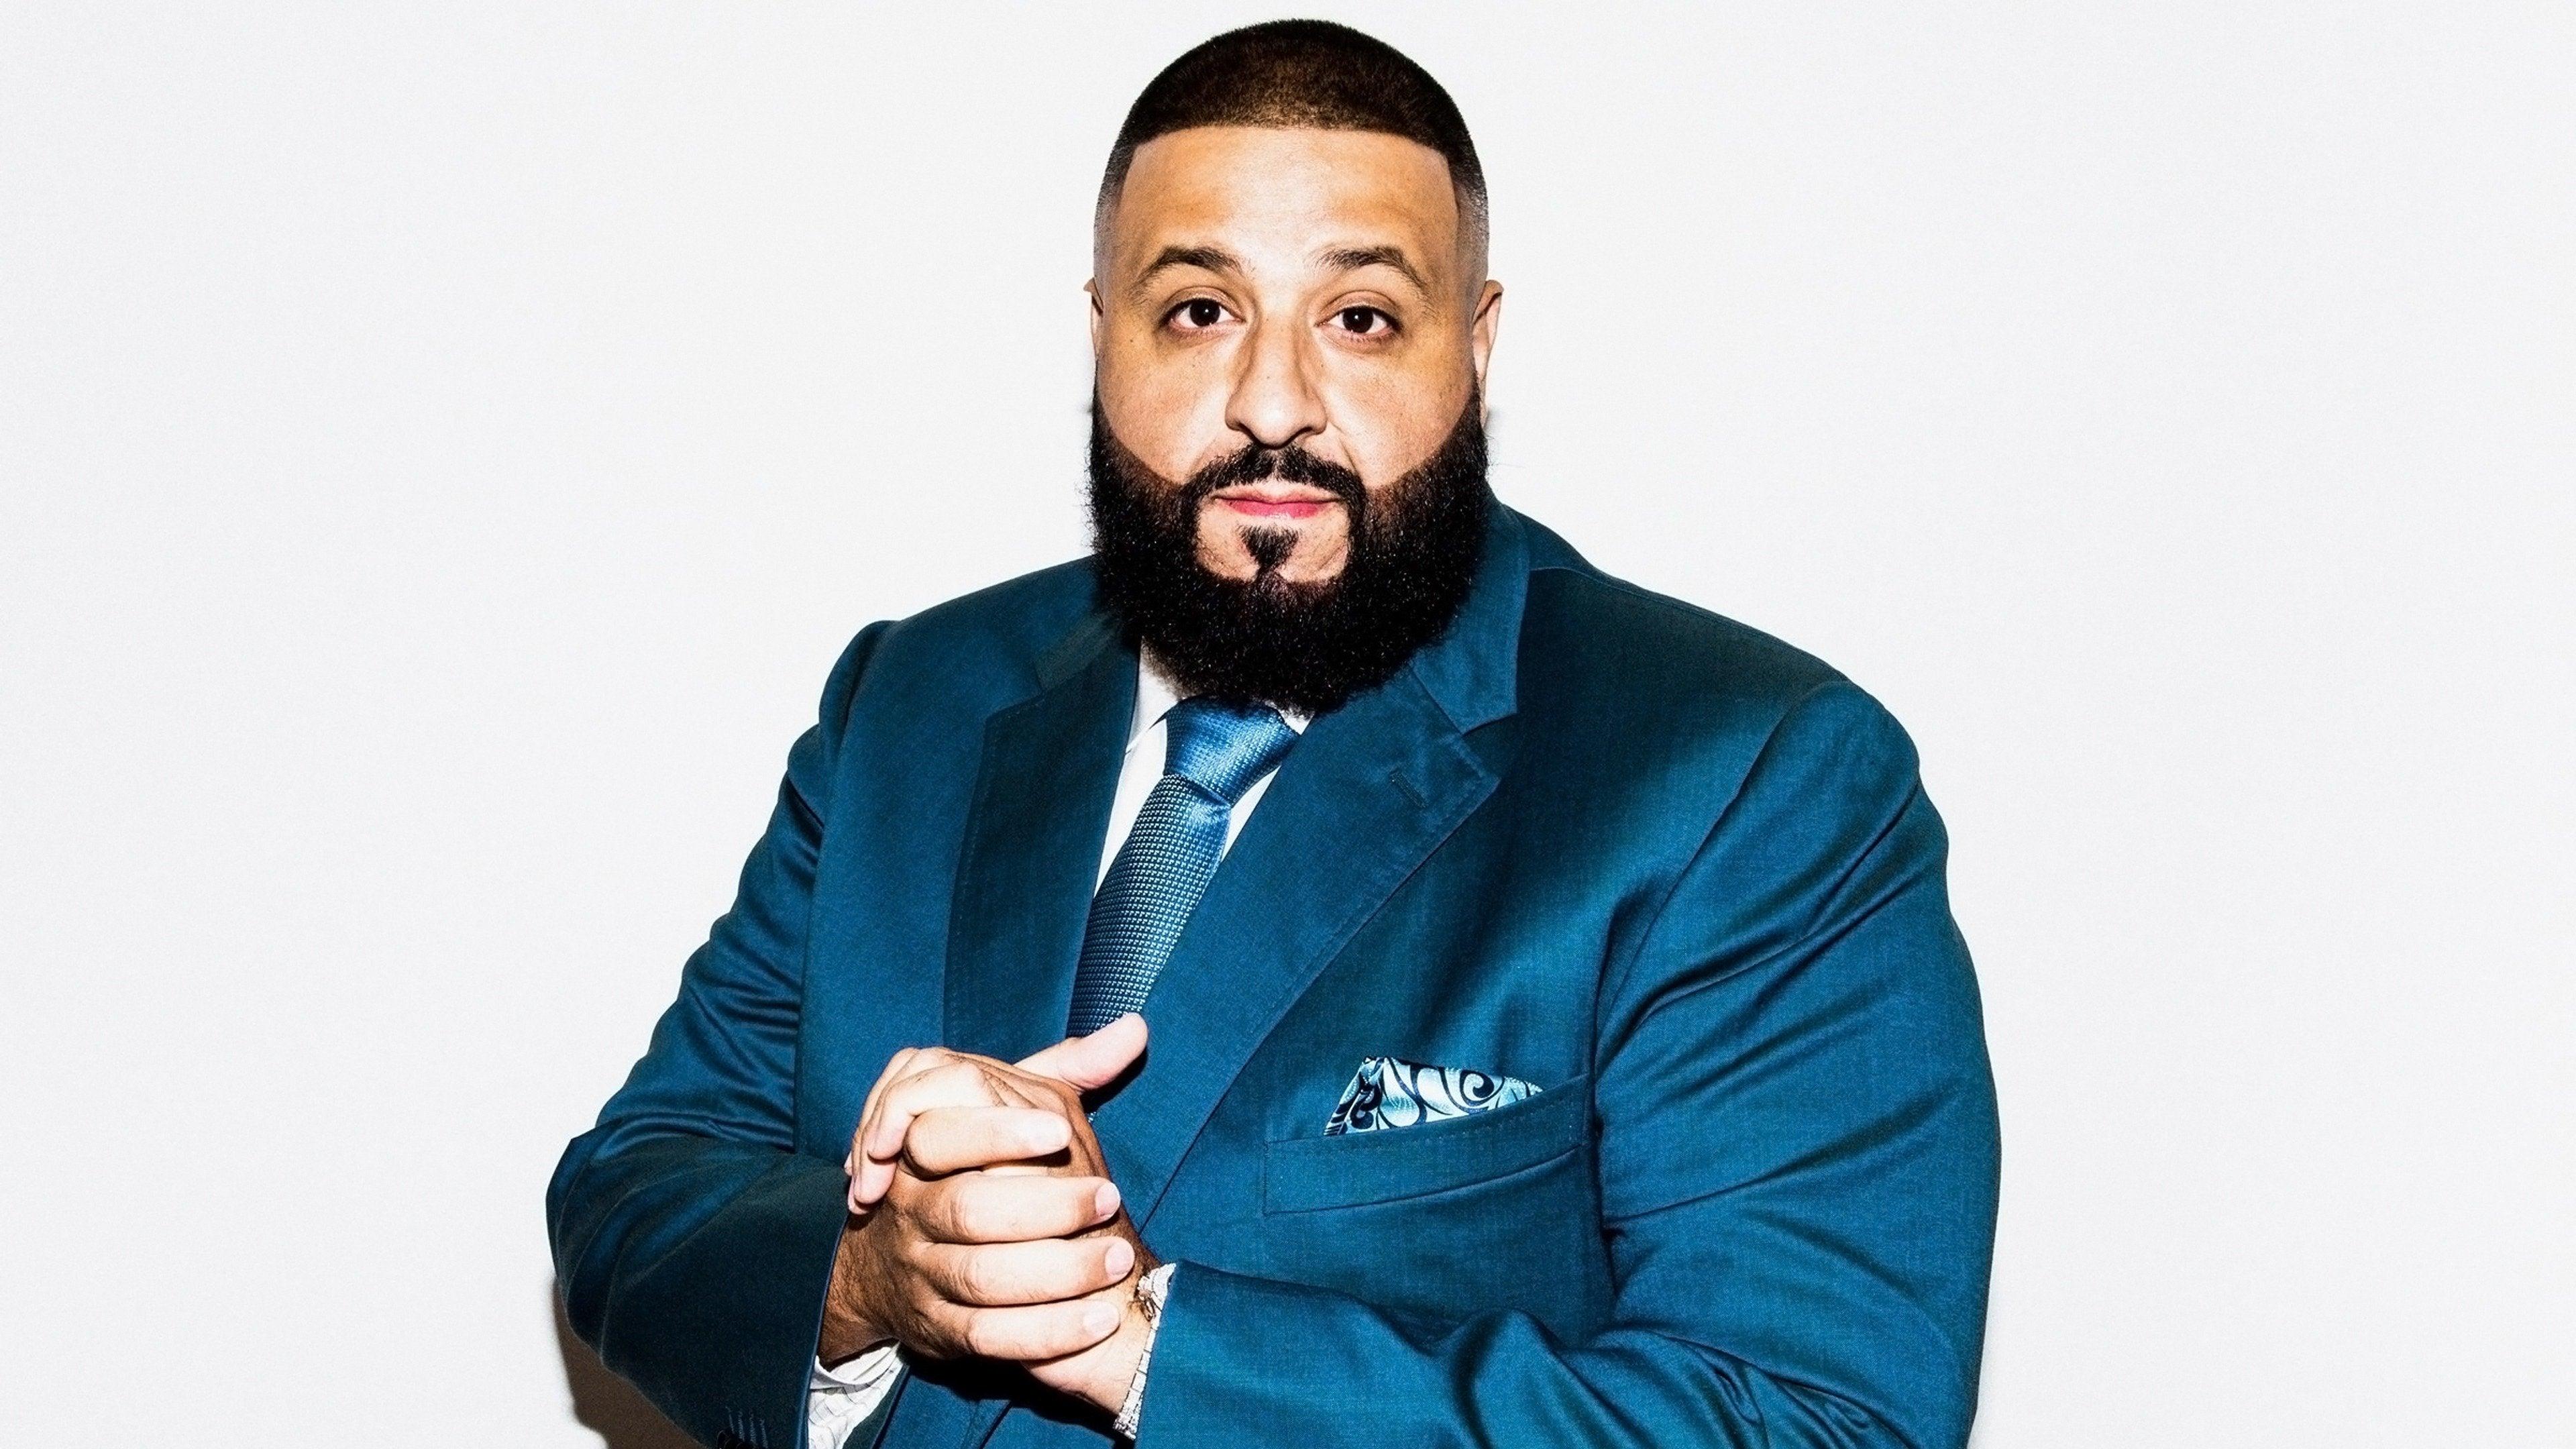 Khaled Con